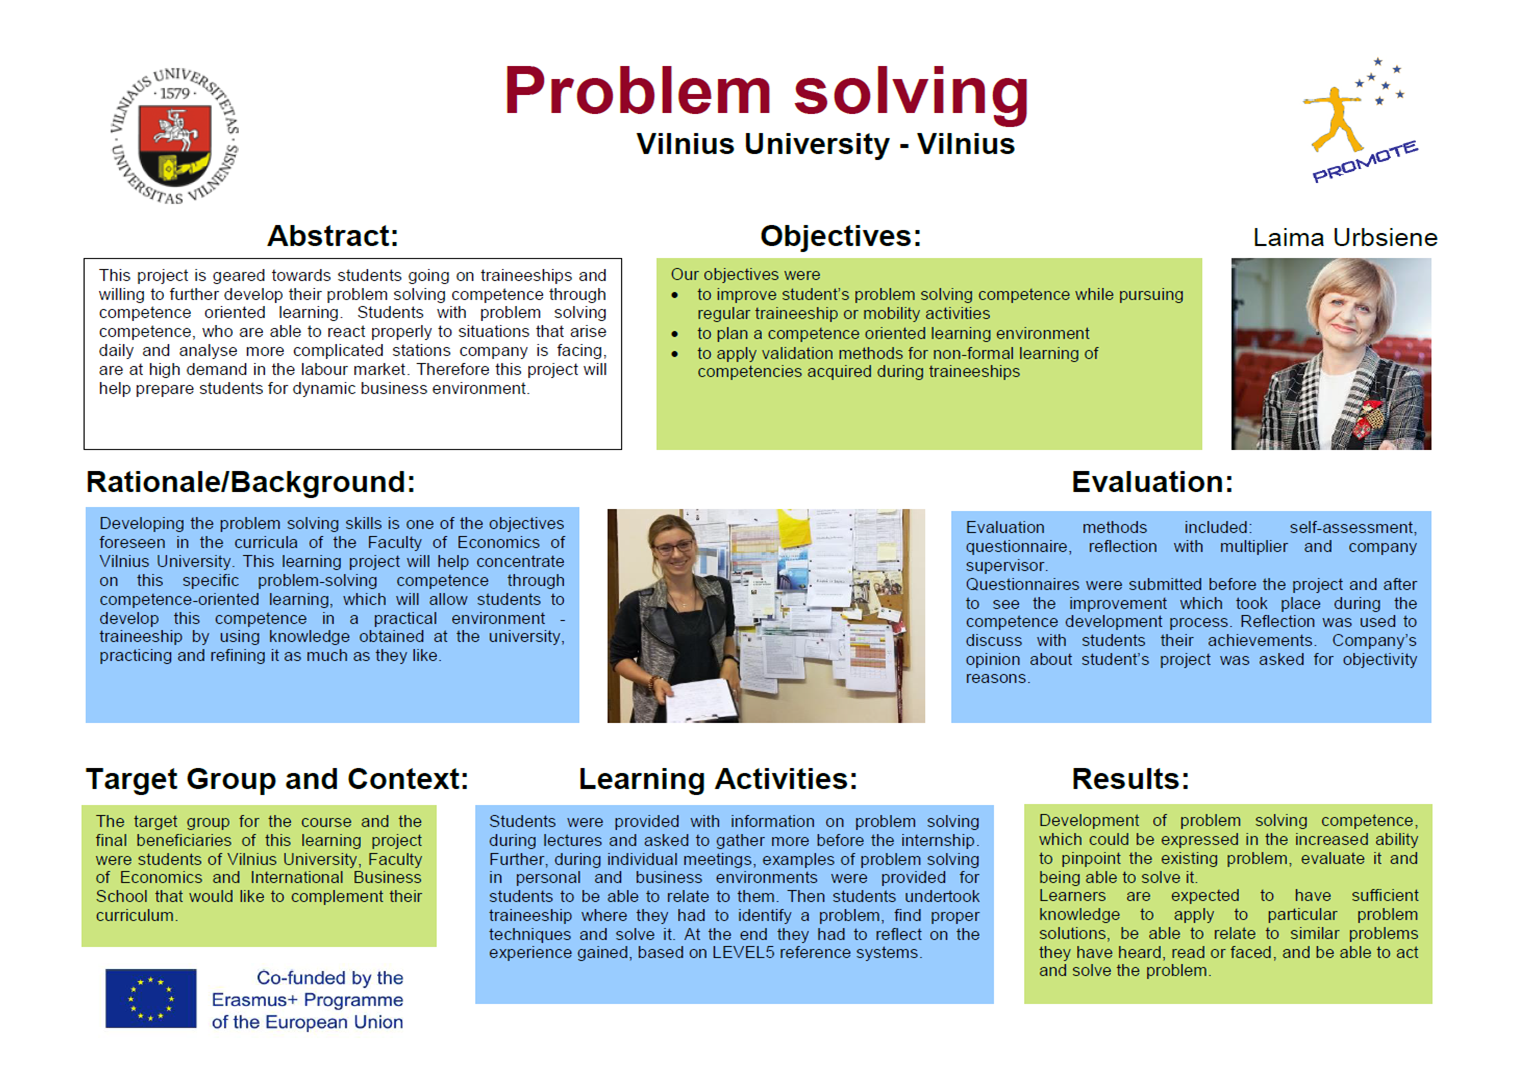 UV_Problem_solving.png